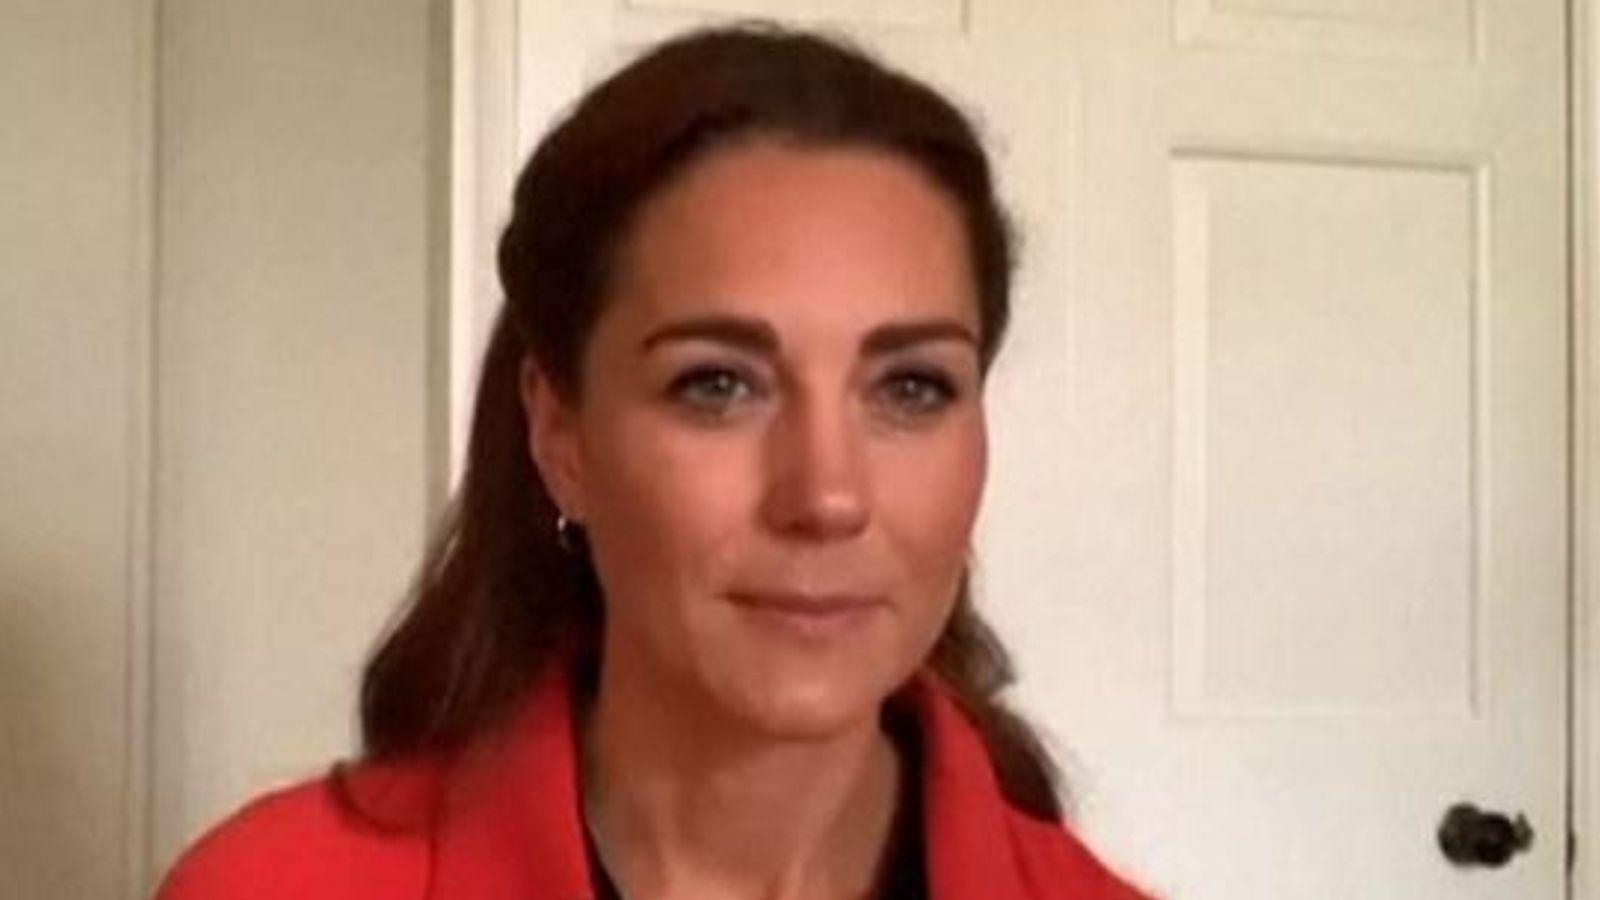 Coronavirus: Kate urges struggling addicts to seek help during COVID-19 lockdown thumbnail